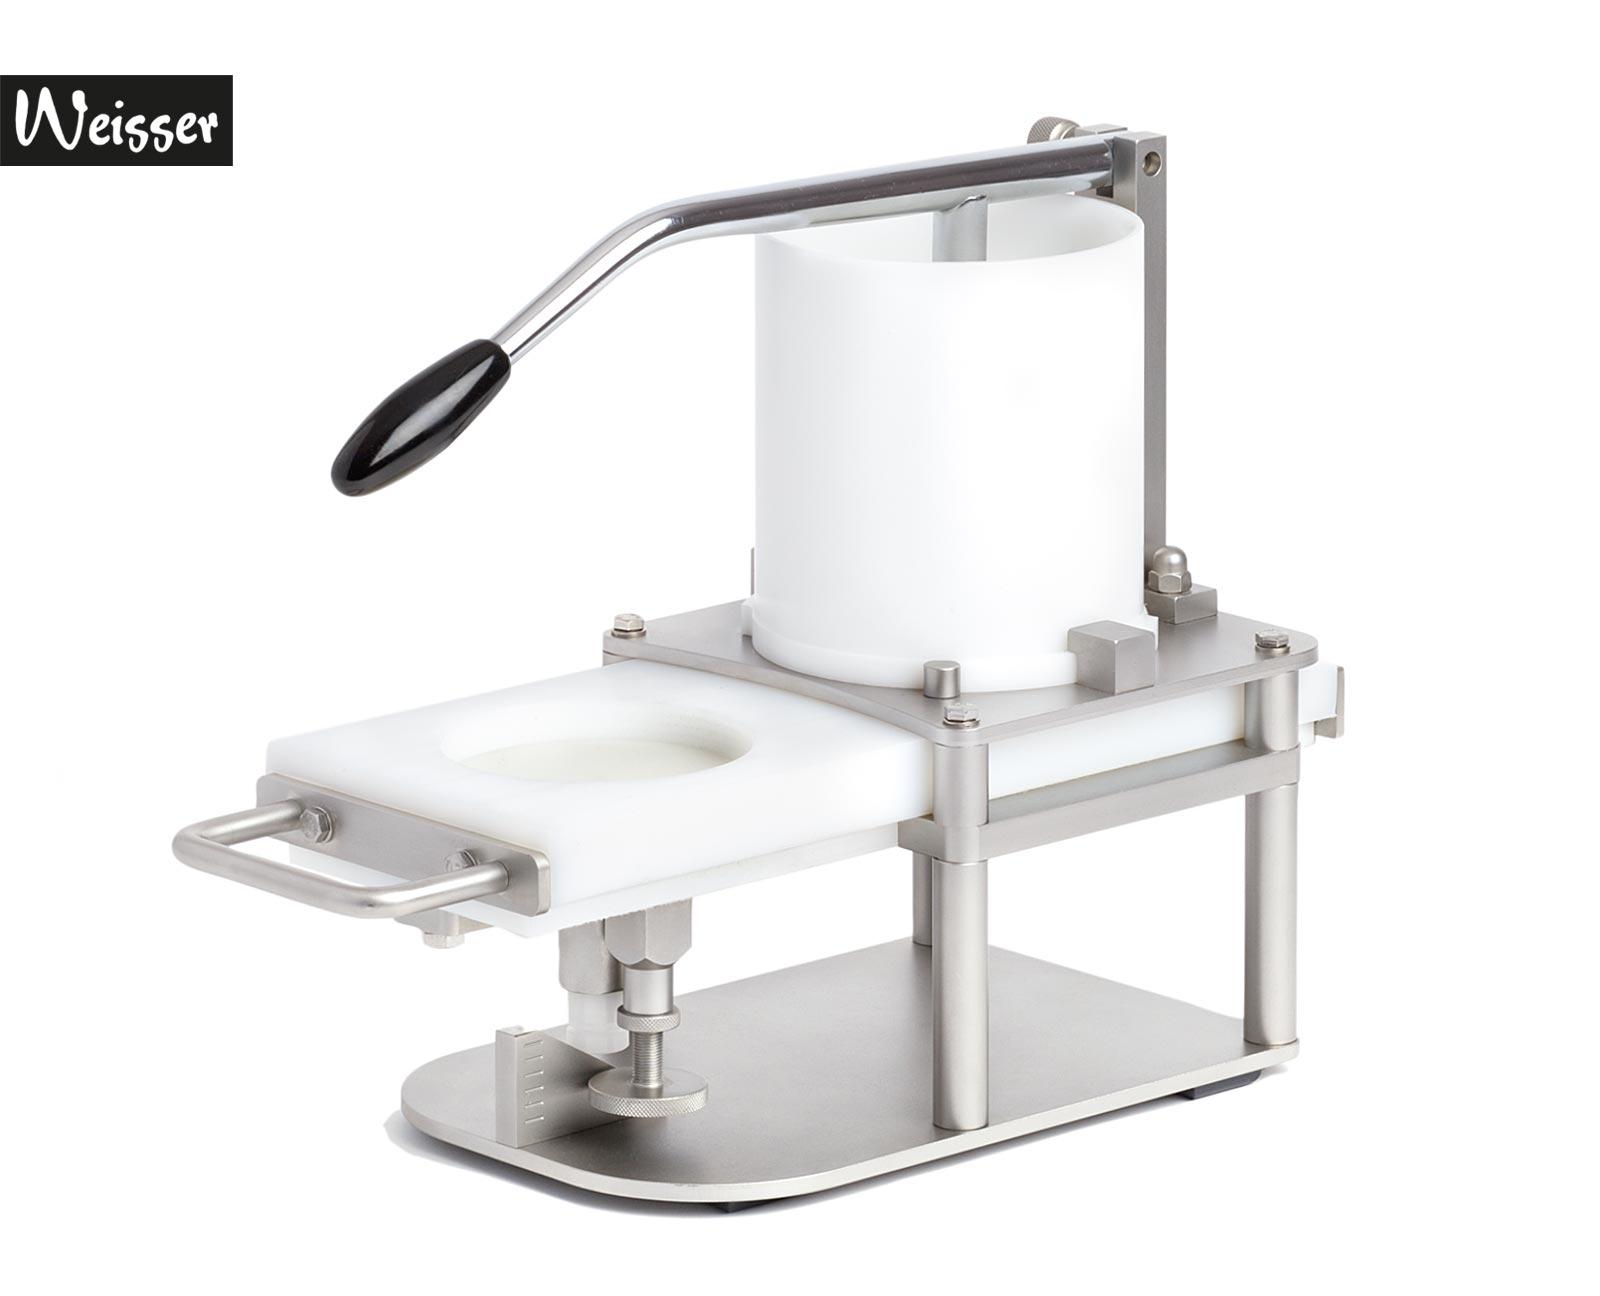 Weisser HP-93 Burger-Formmaschine